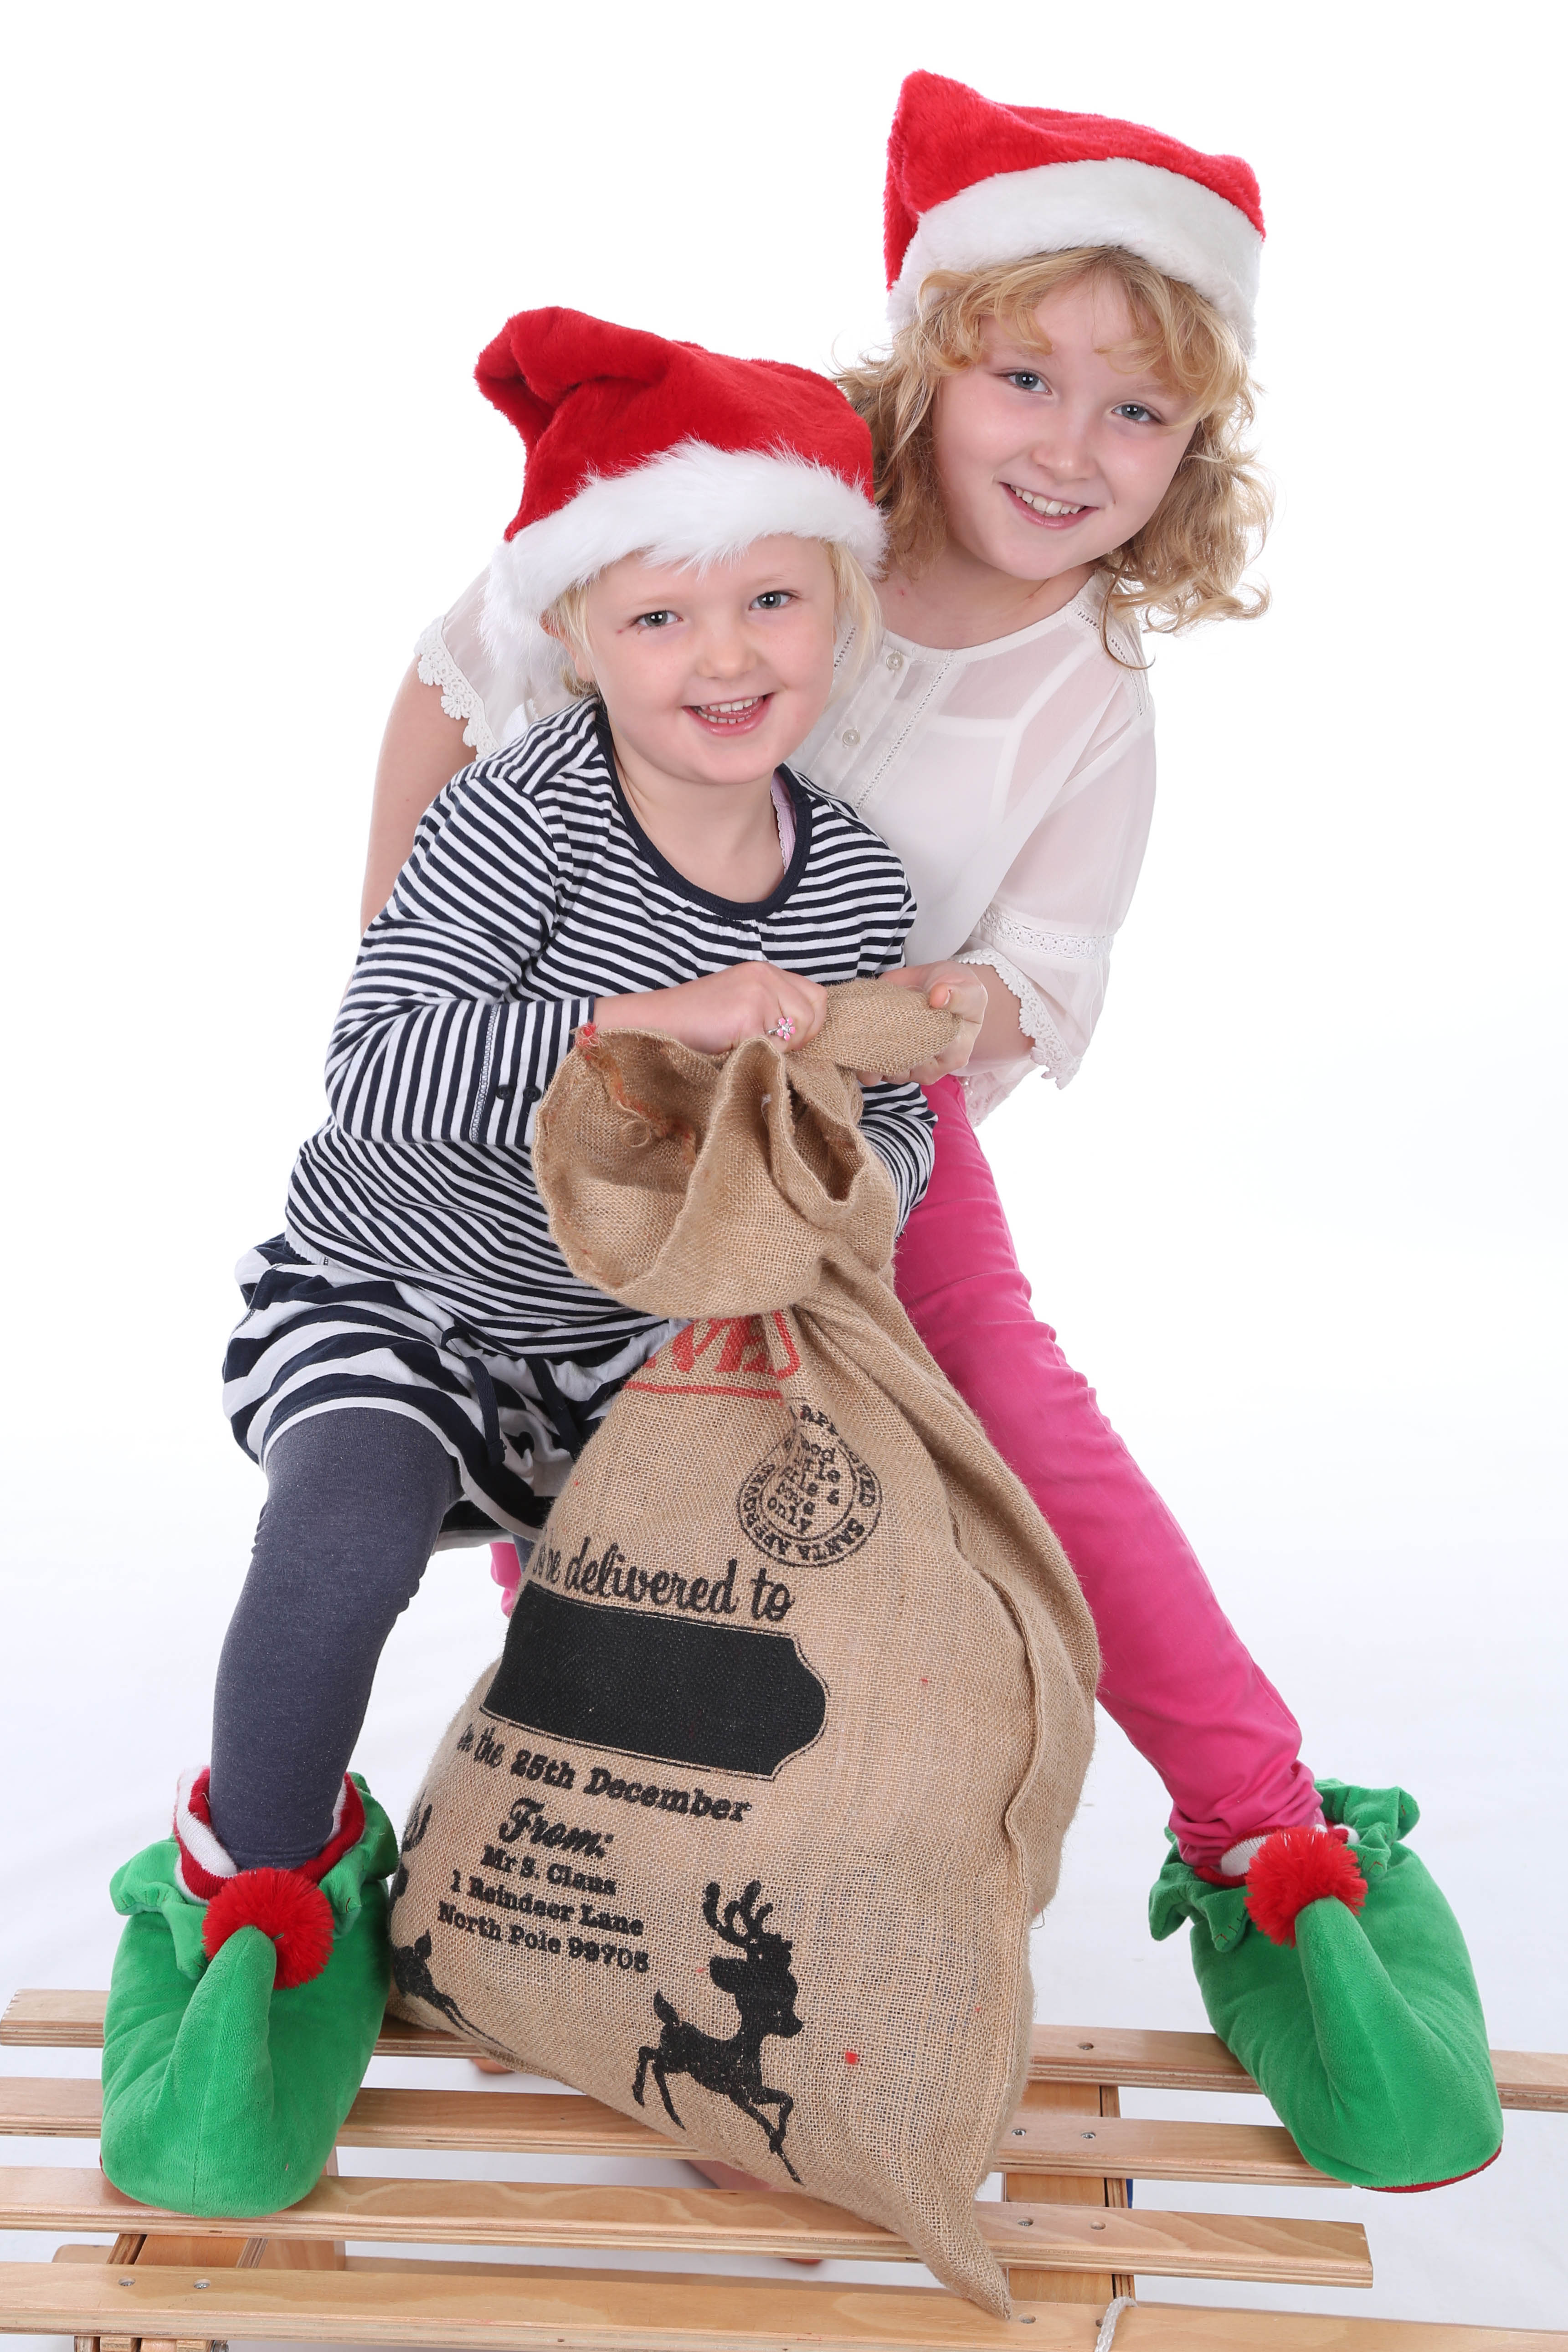 Santa's Christmas Sack, Children, Christmas, Fun, Photoshoot, HQ Photo